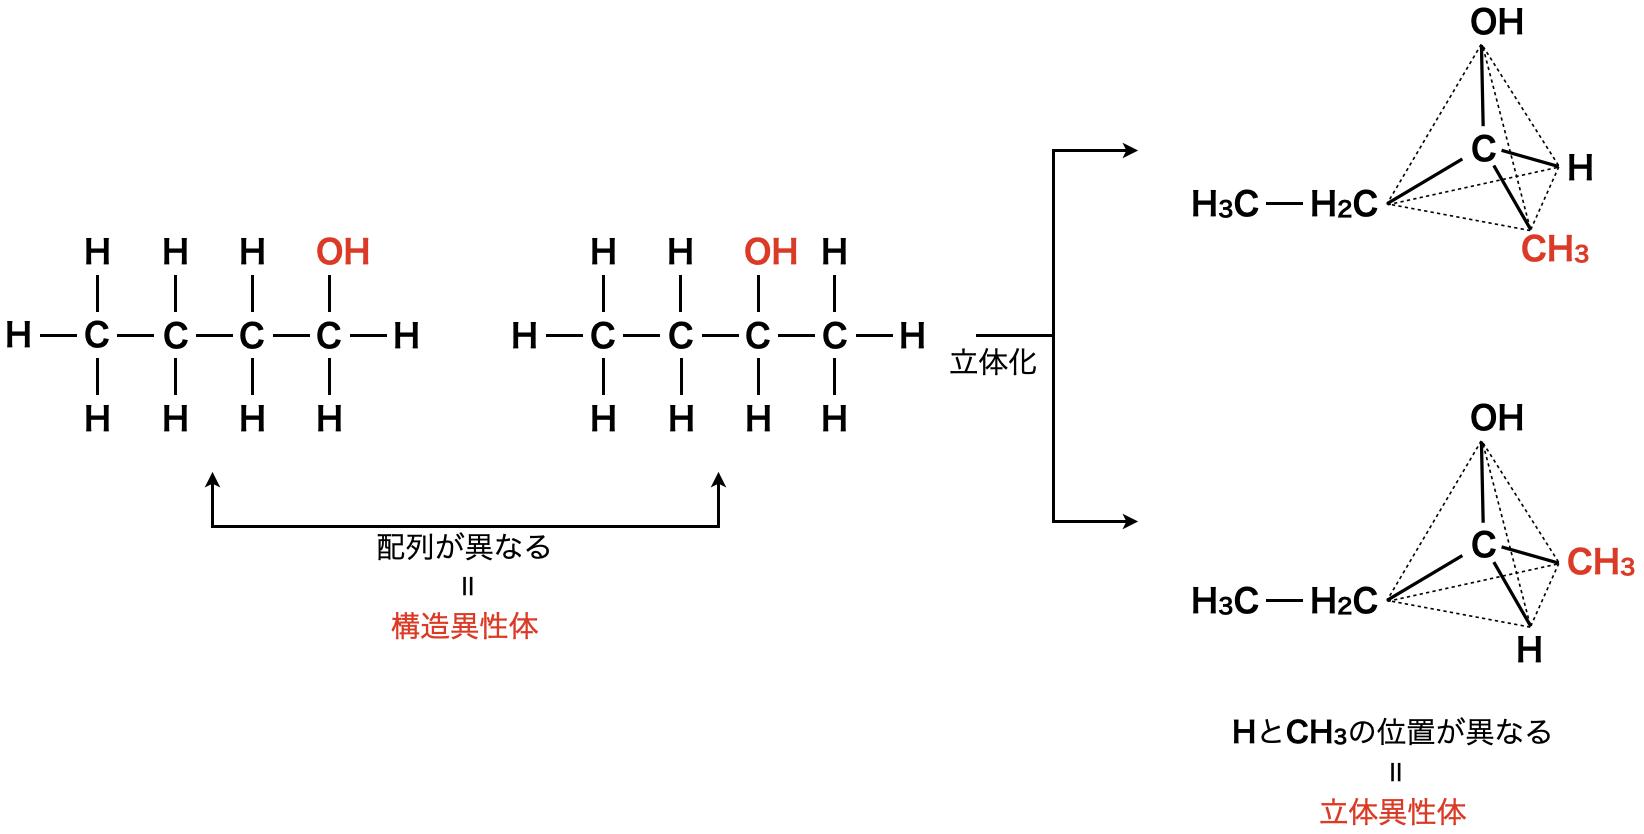 isomer